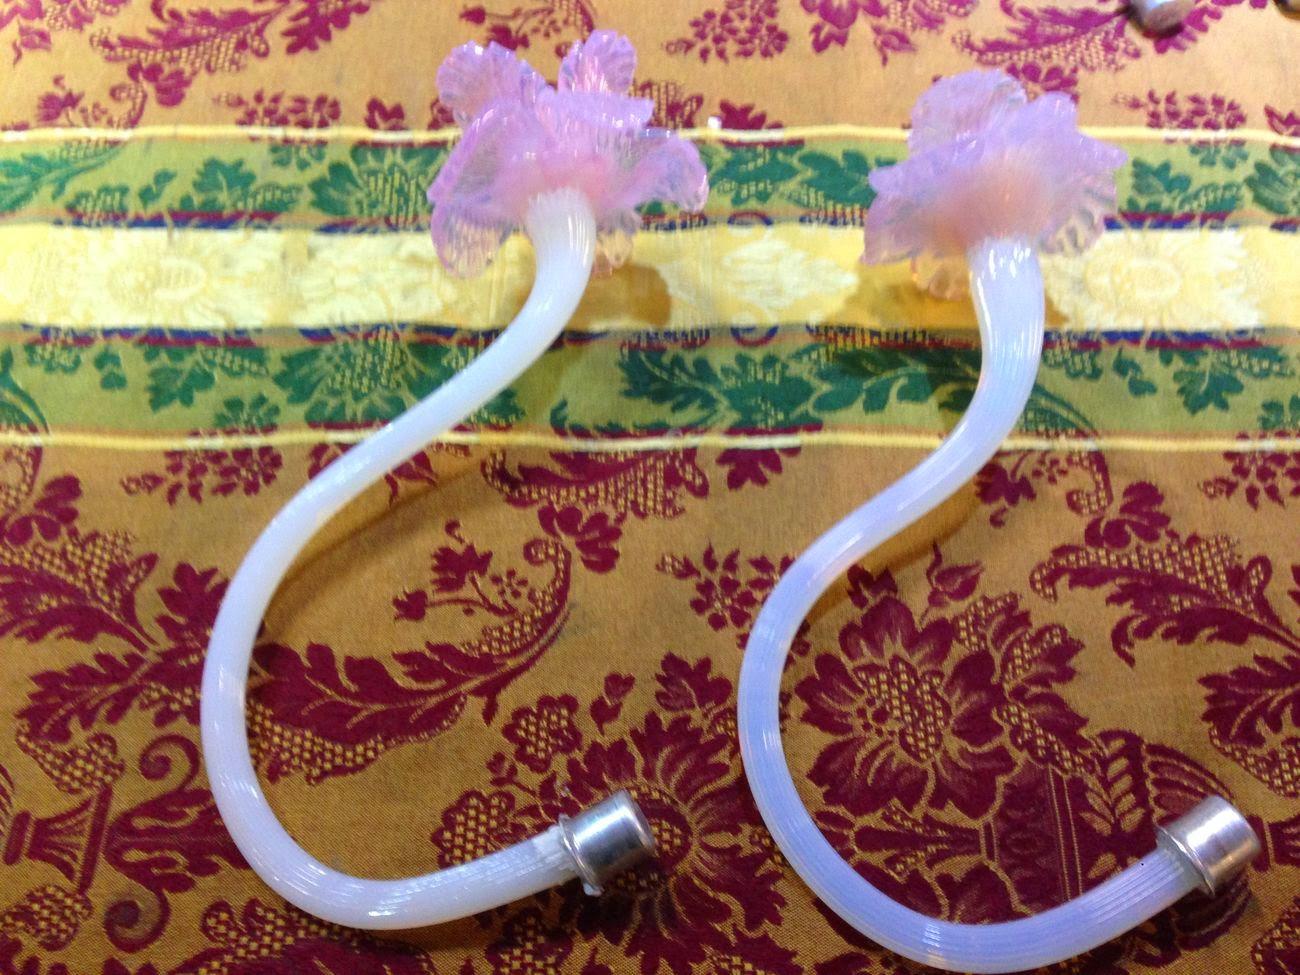 ricambi lampadari murano : Ricambi per lampadari in vetro di Murano